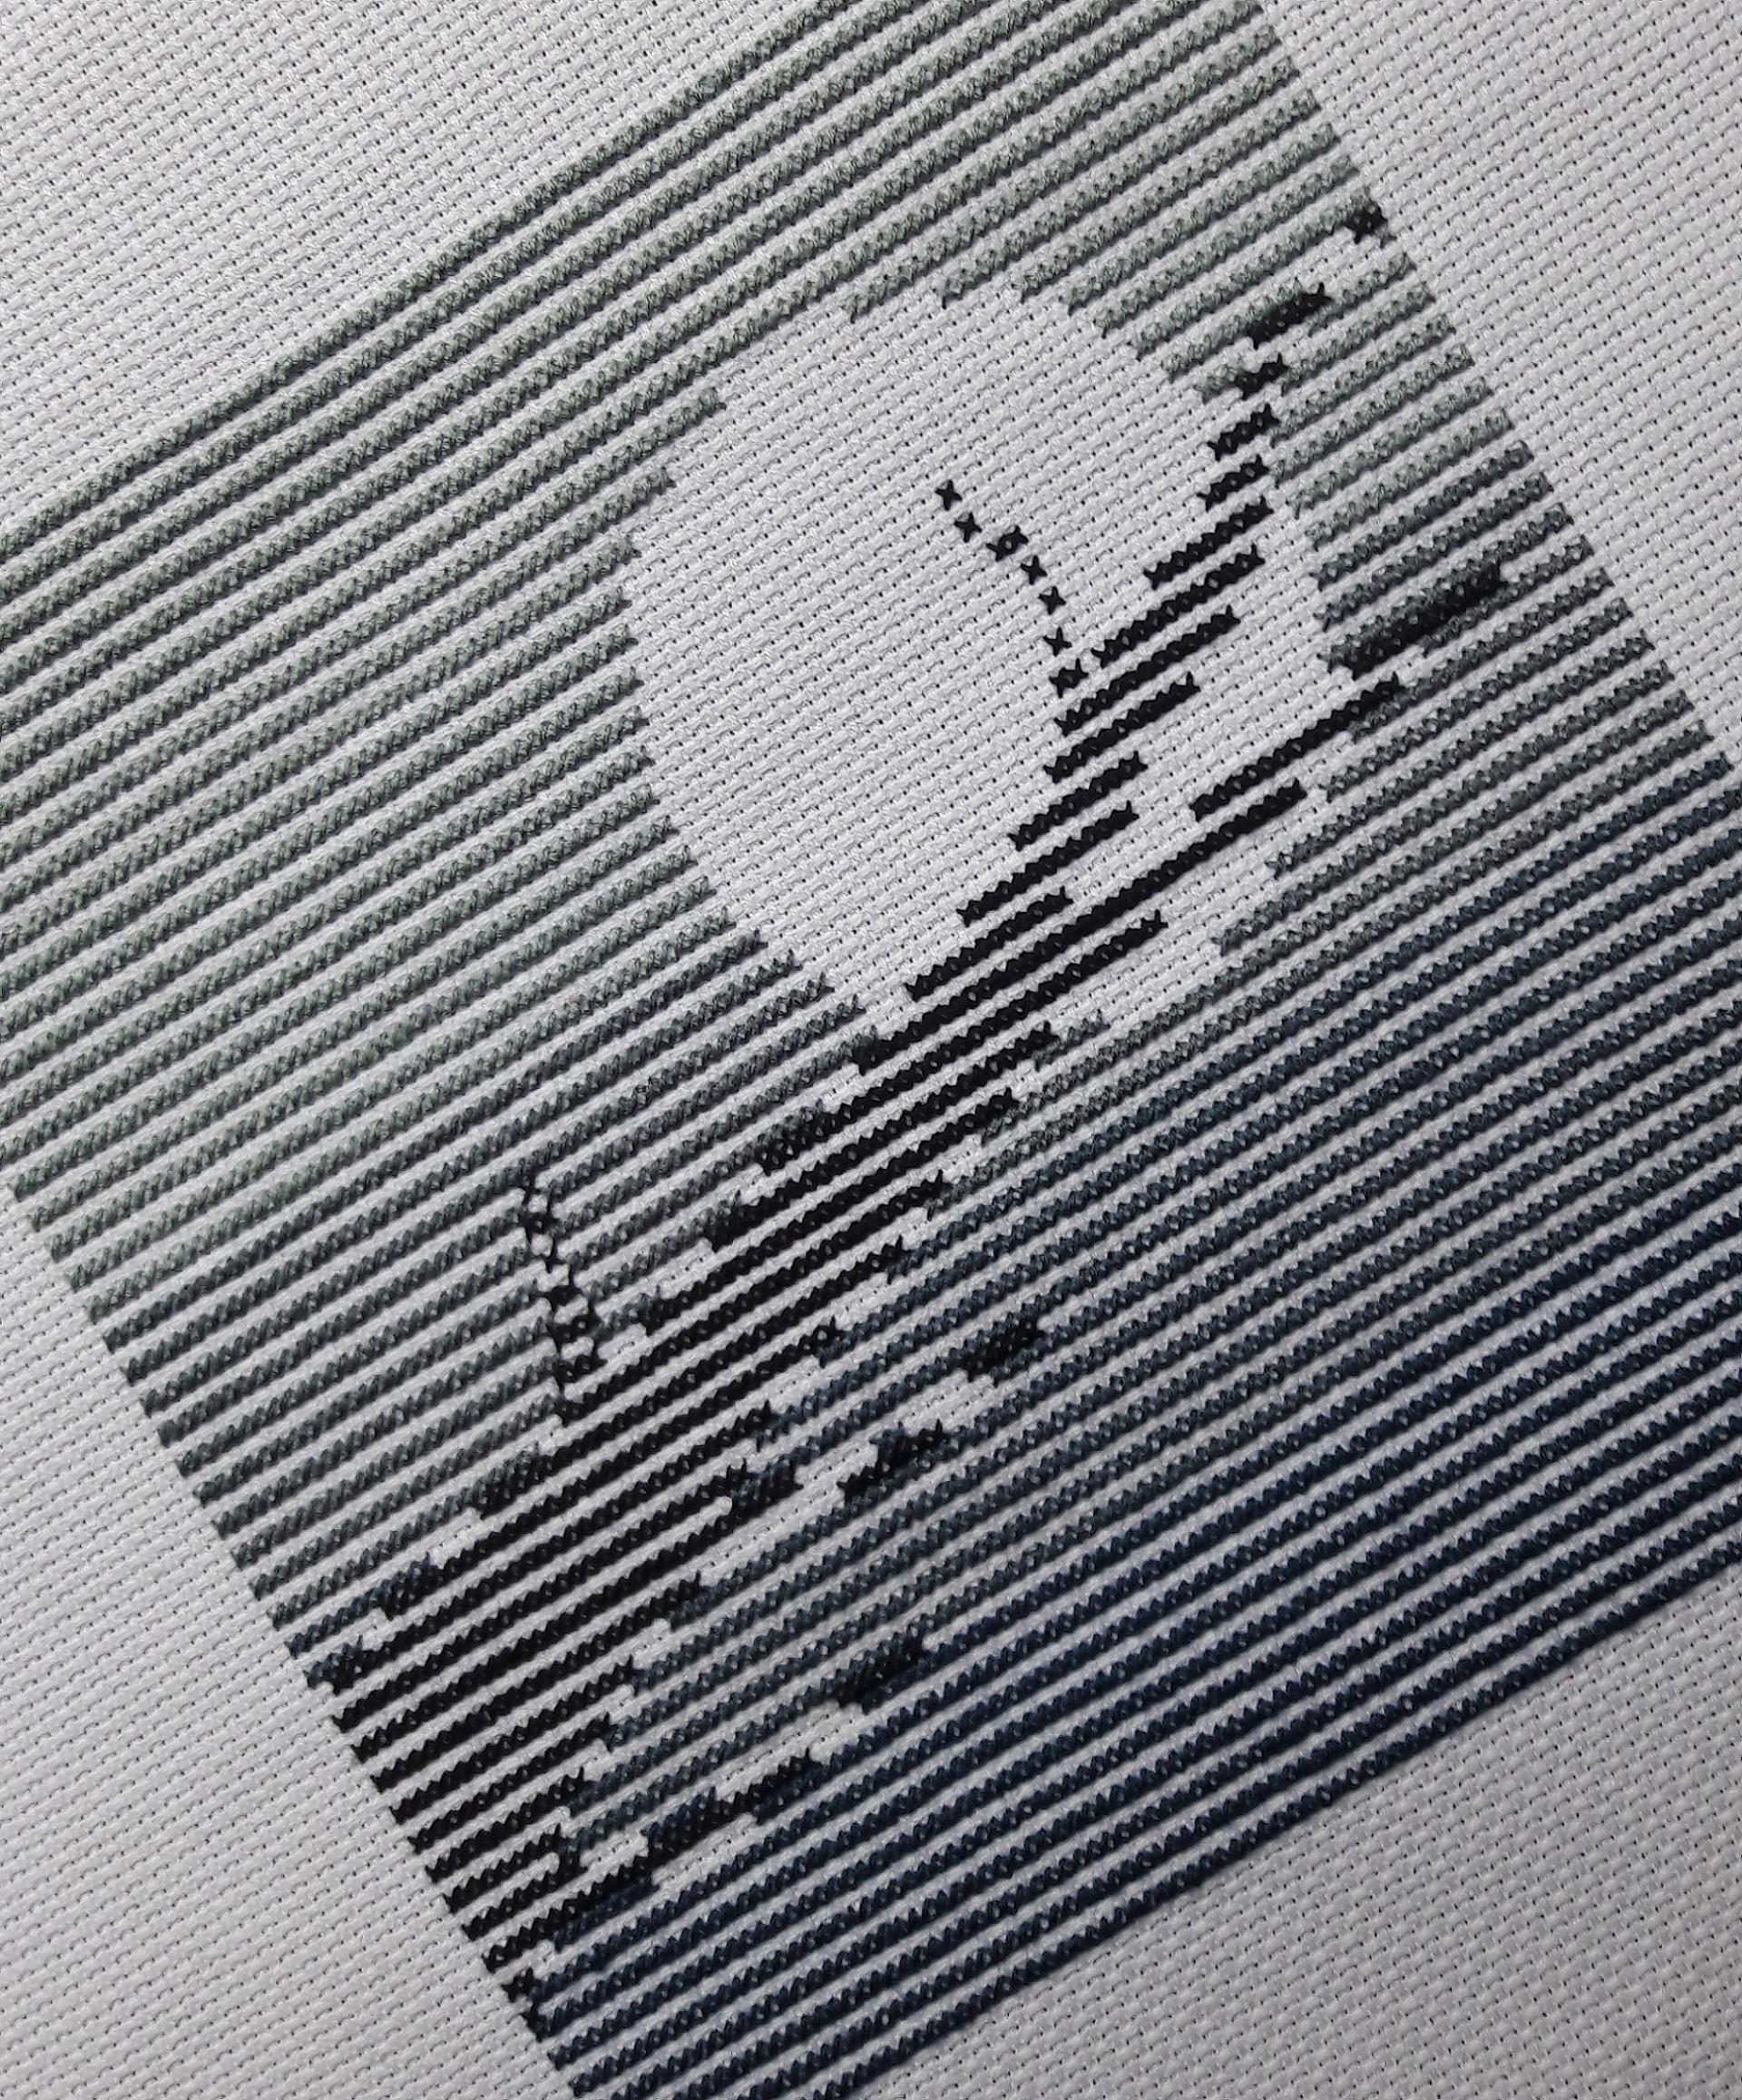 Minimalist Cross Stitch Pattern Contemporary Embroidery Etsy Cross Stitch Patterns Stitch Patterns Cross Stitch